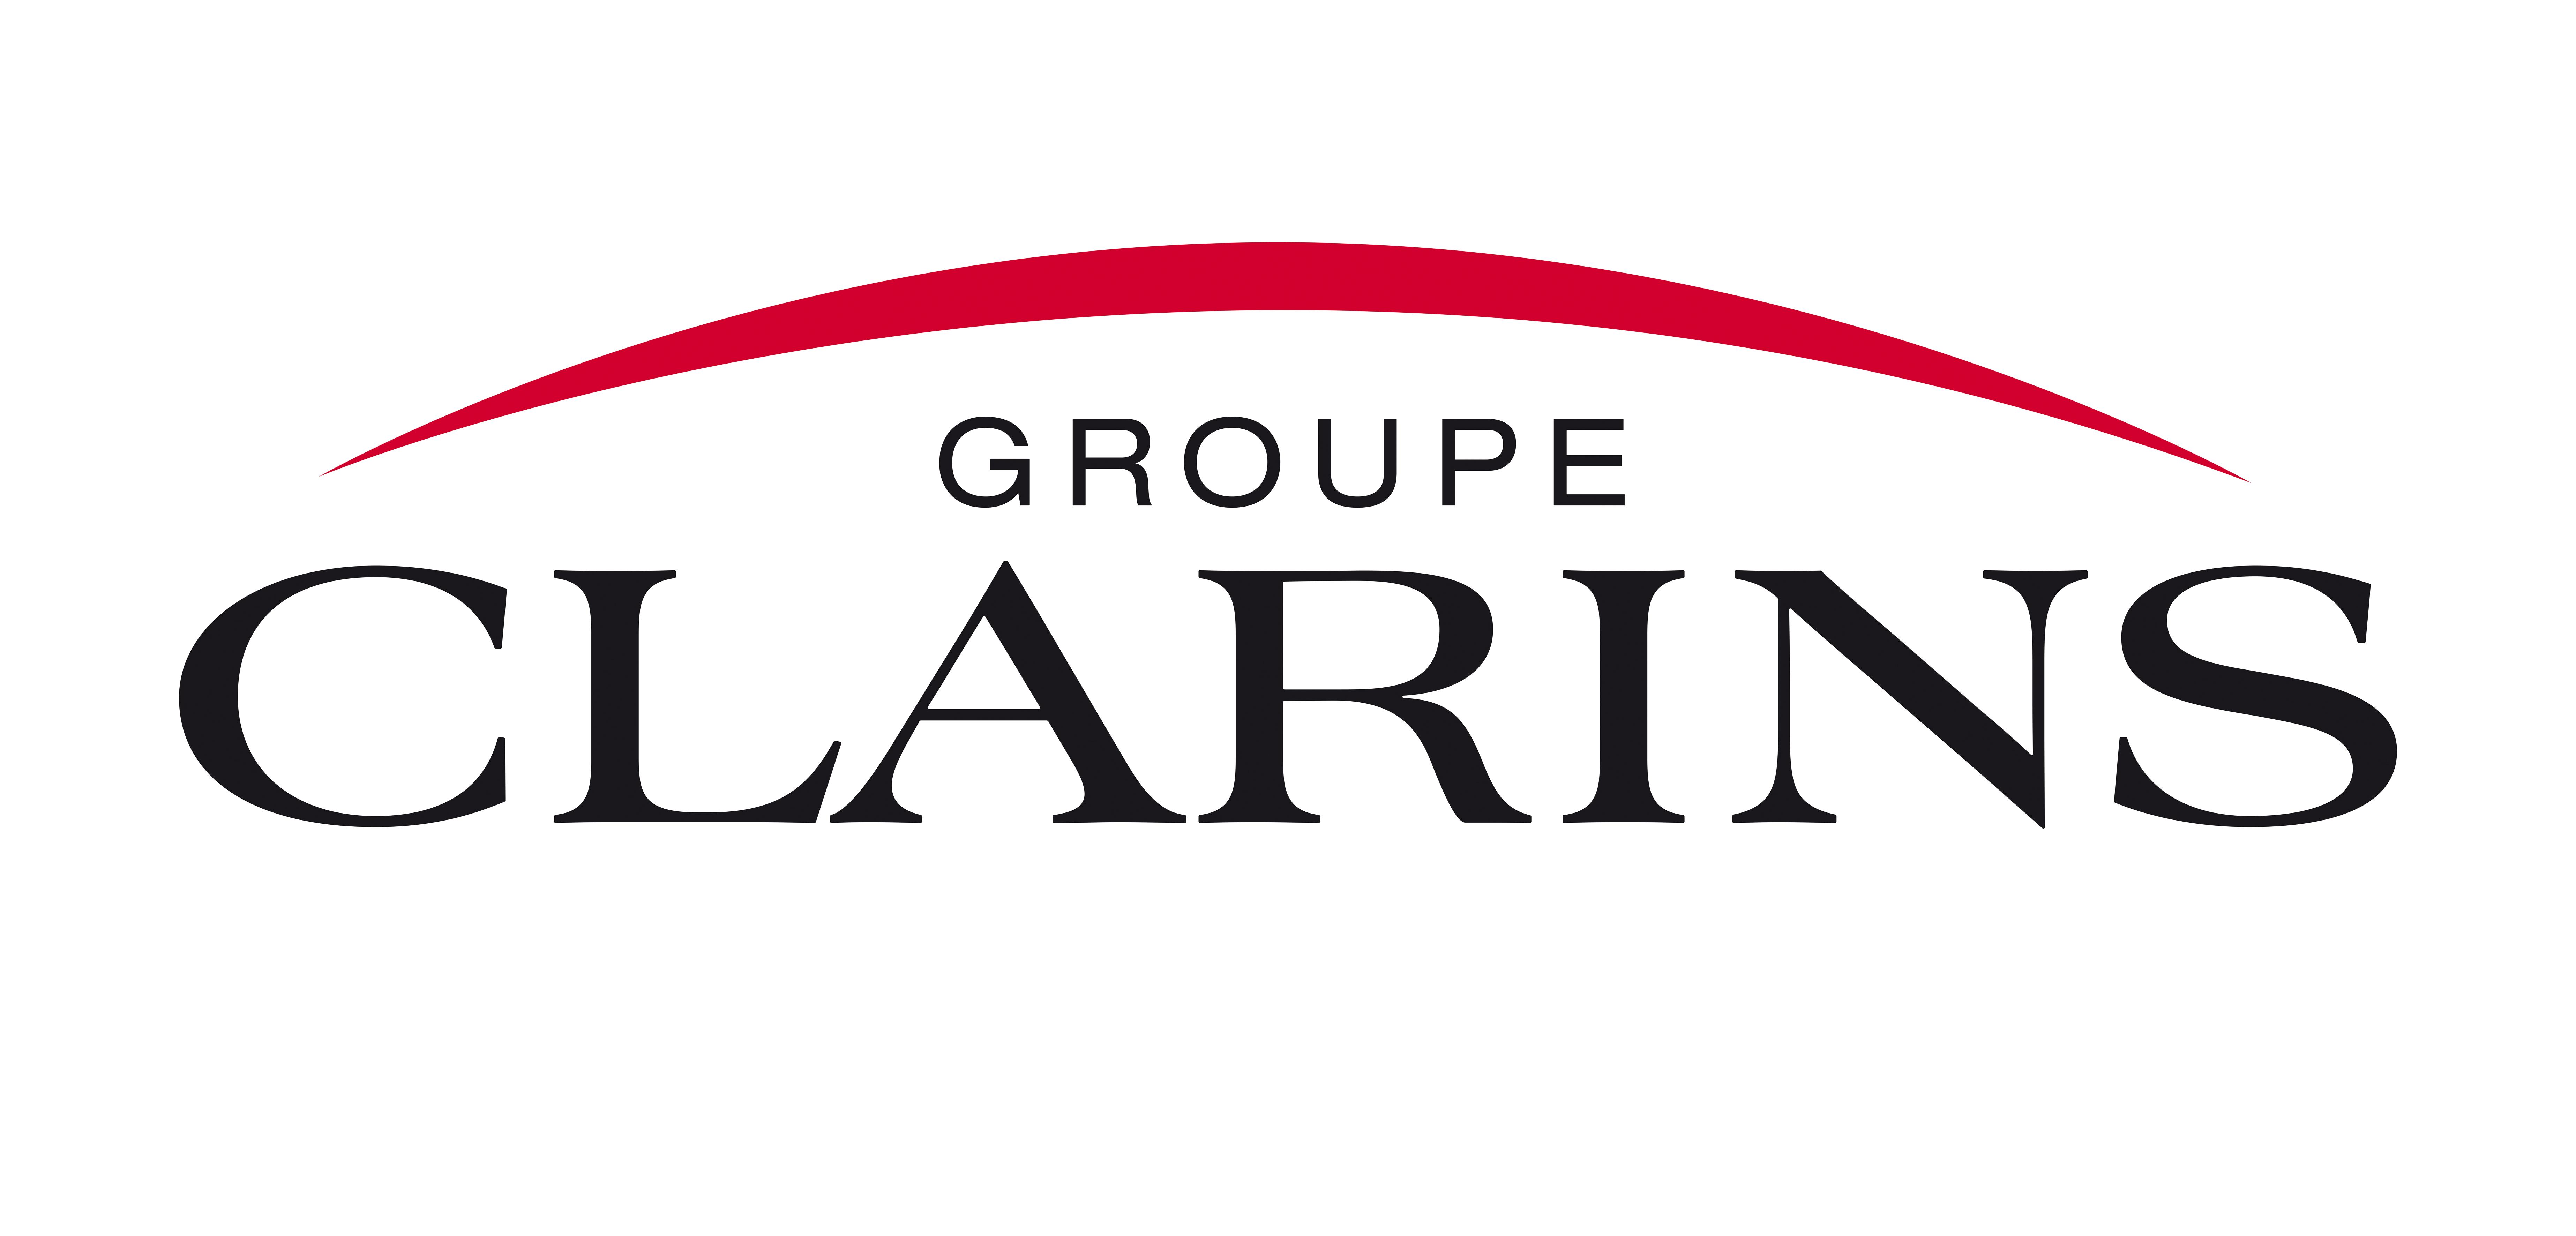 Clarins - Wikipedia